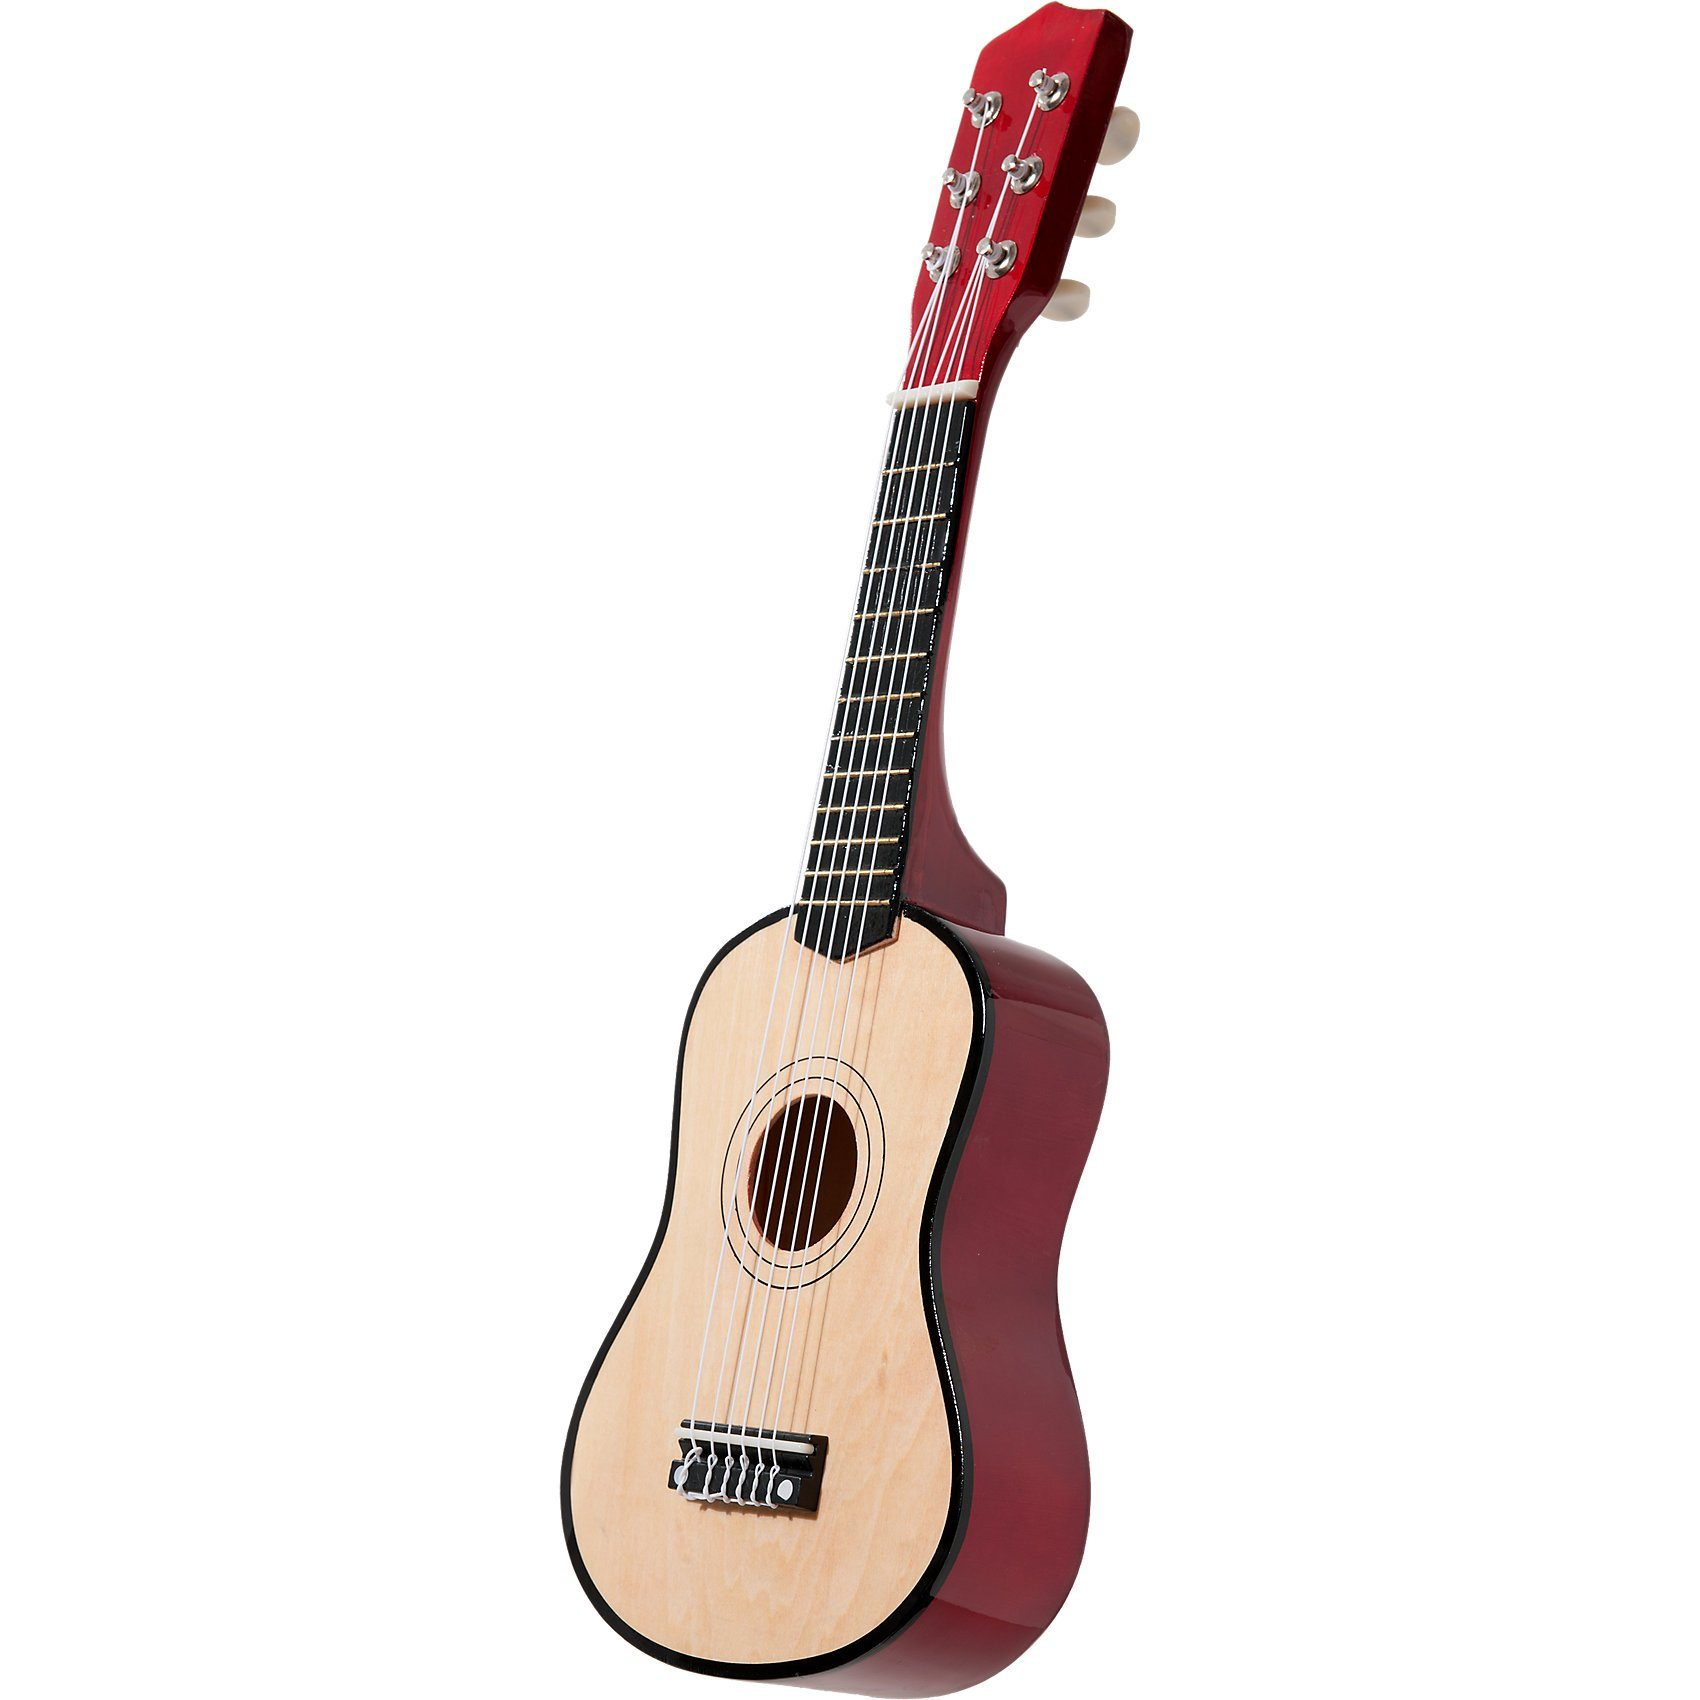 Bontempi Klassische Holzgitarre 75 cm